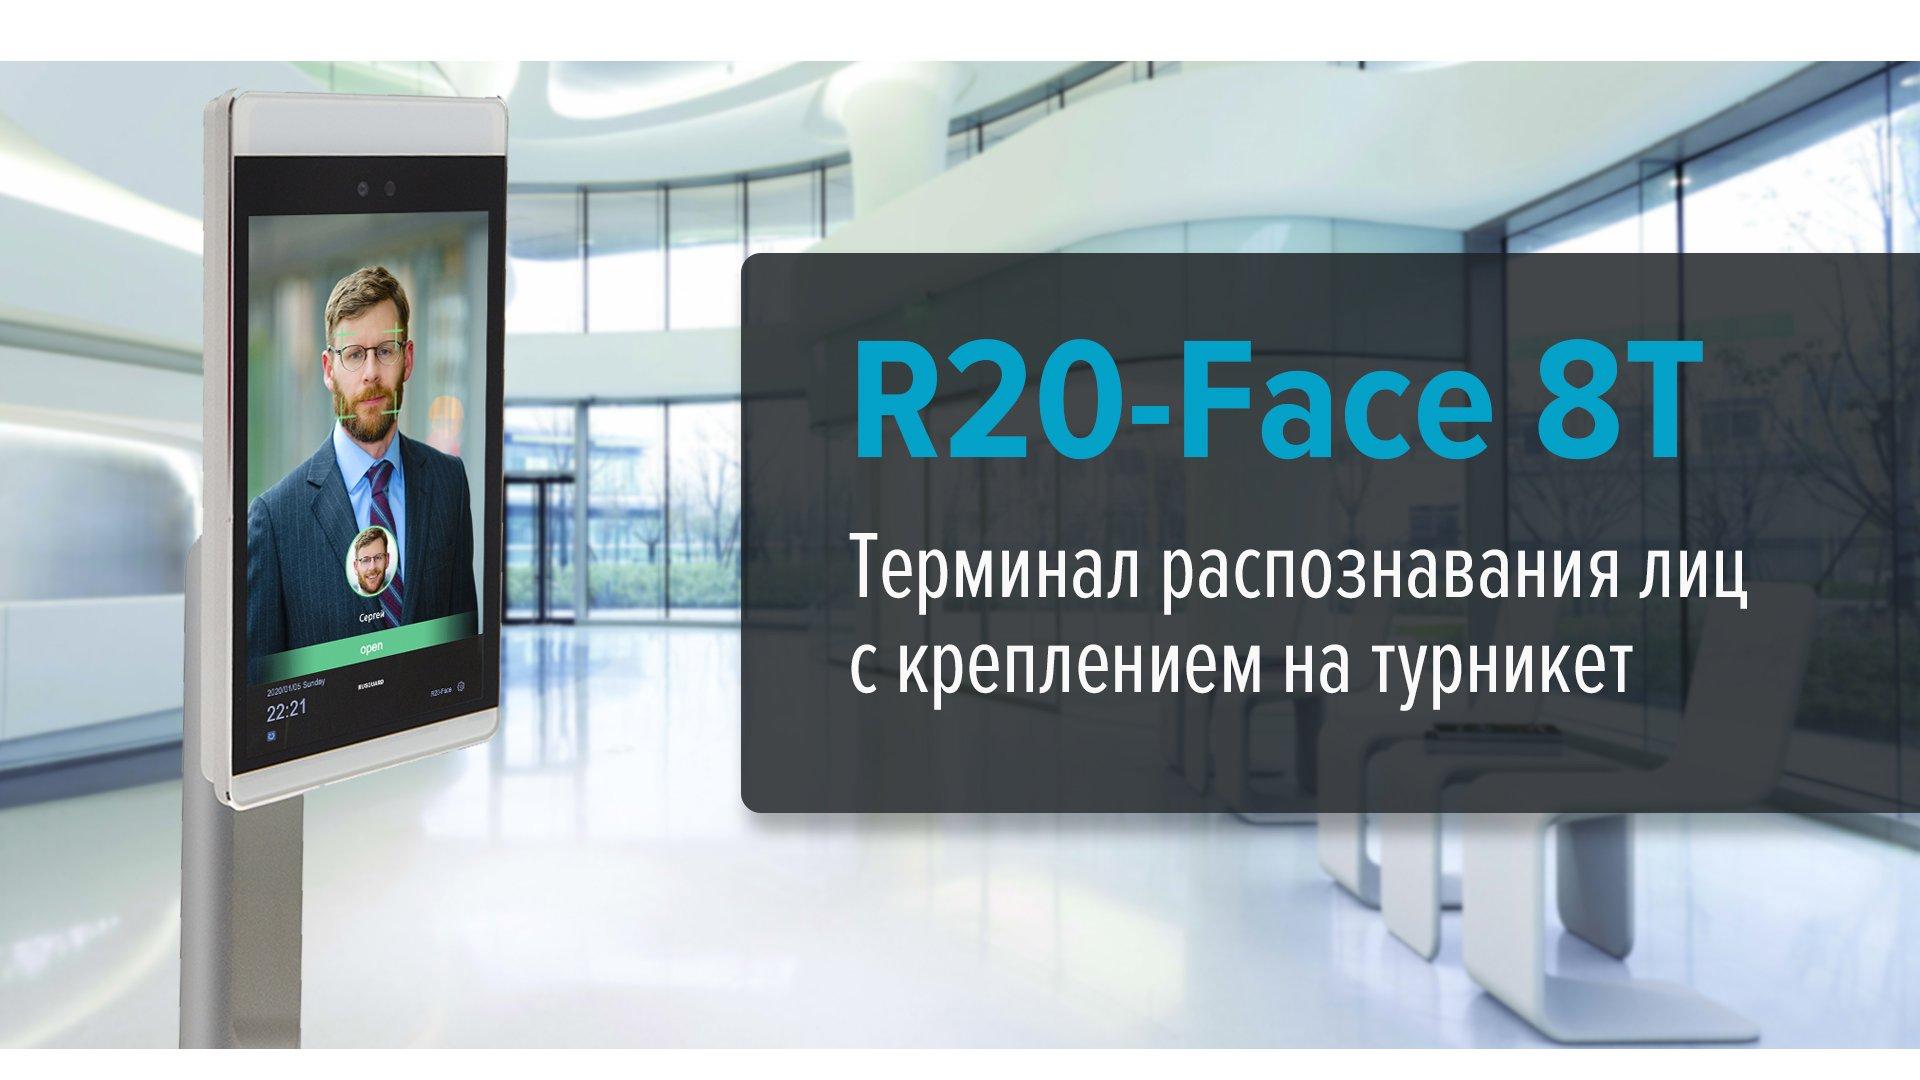 Терминал распознавания лиц R20-Face 8T